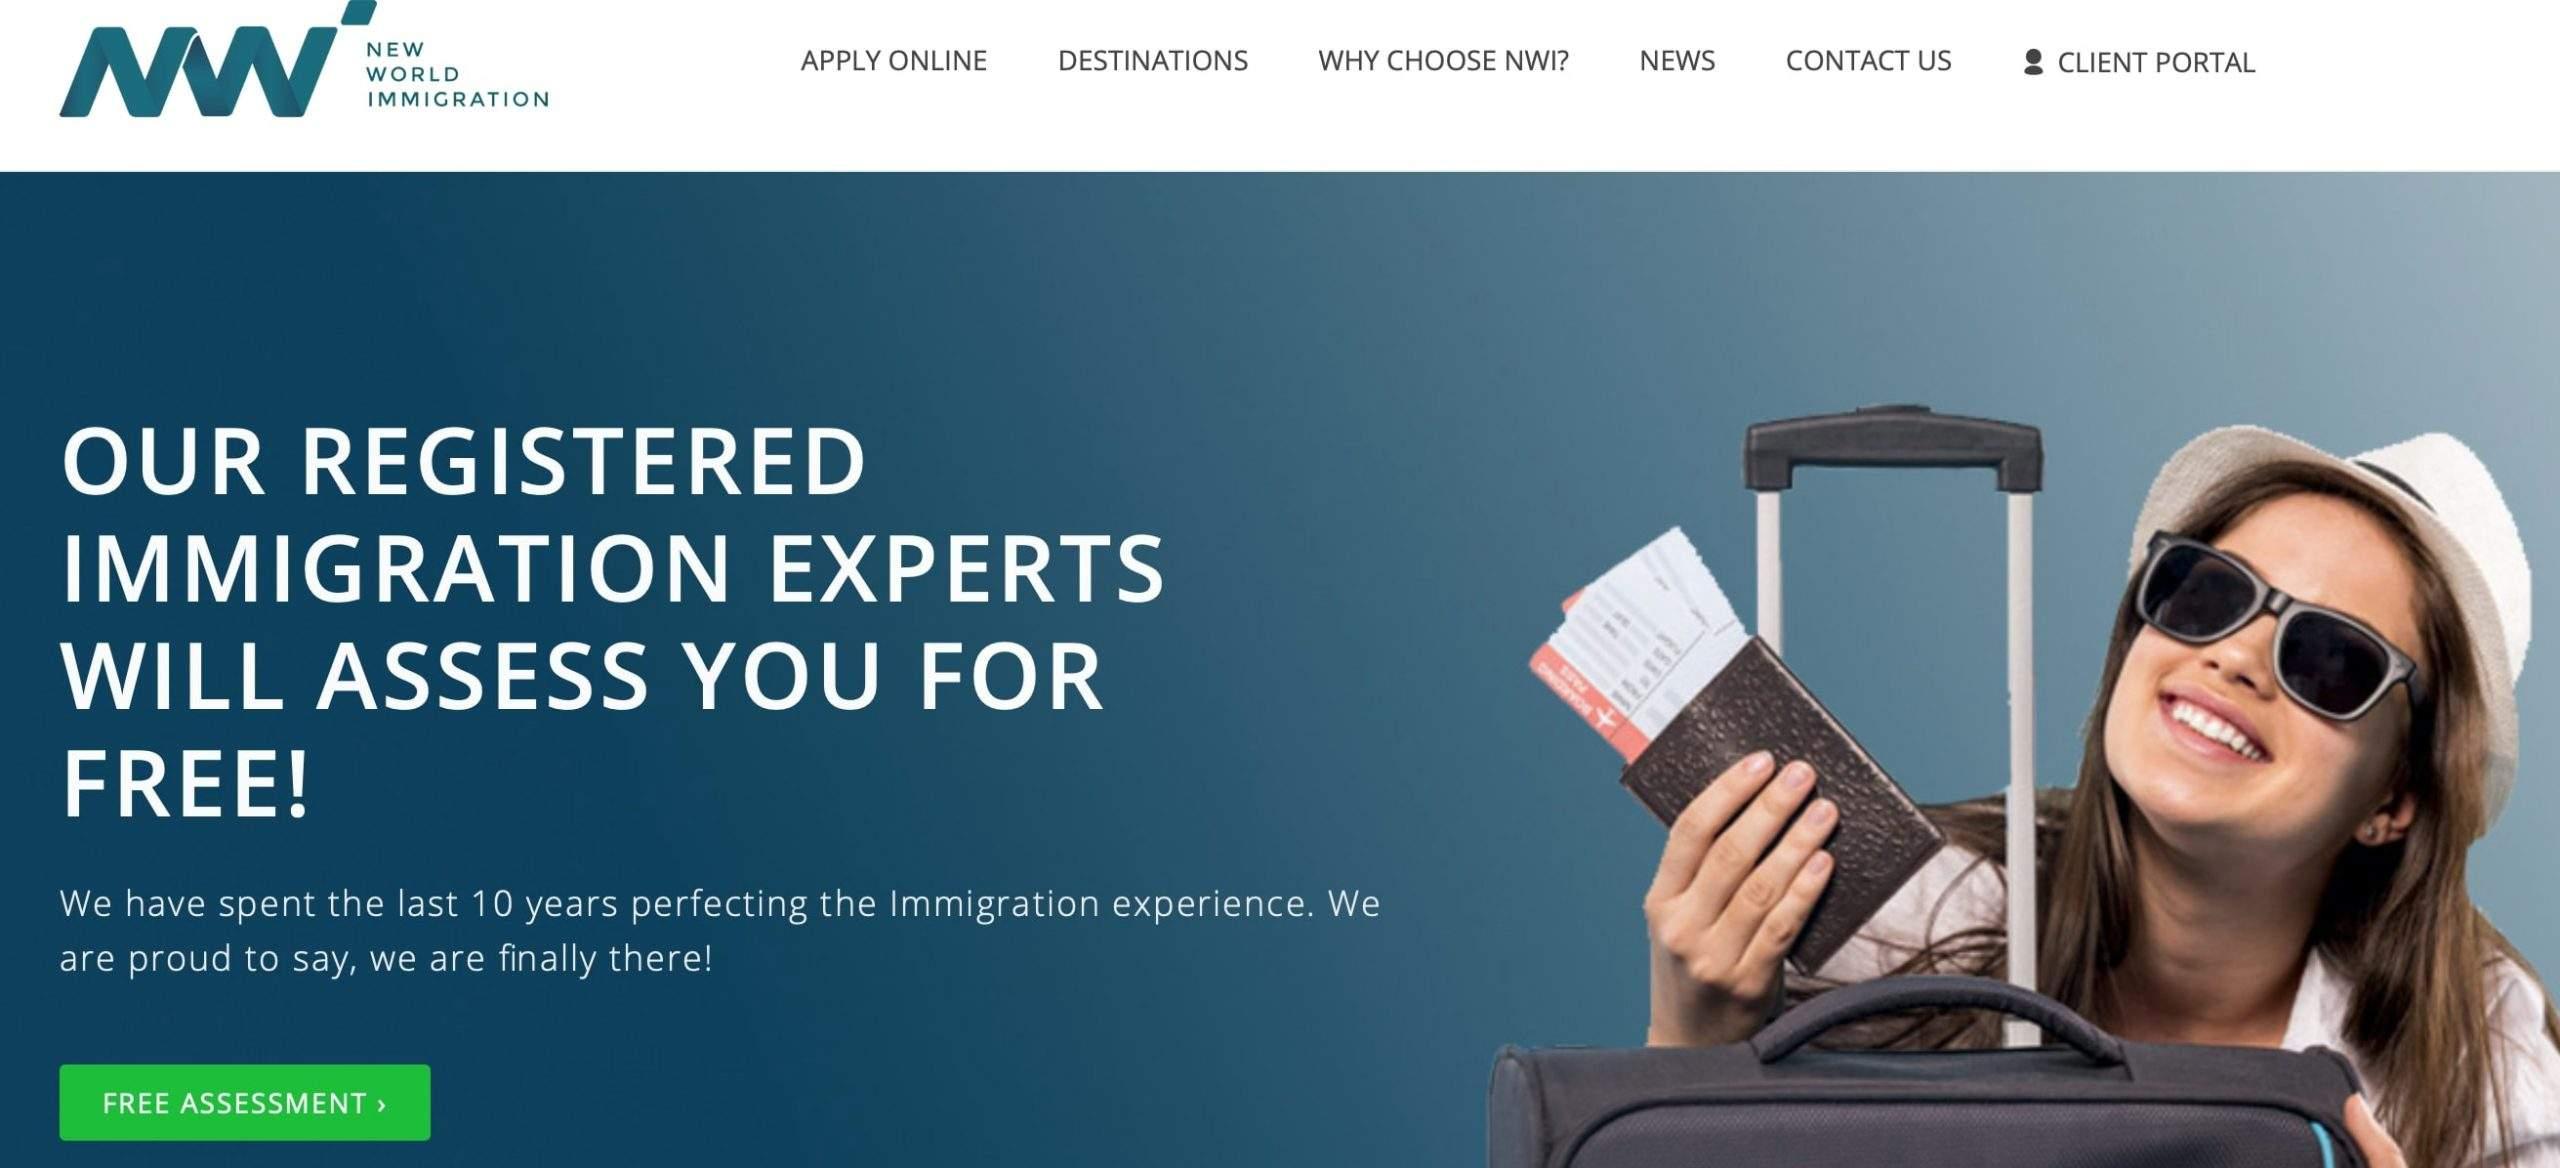 New World Immigration website